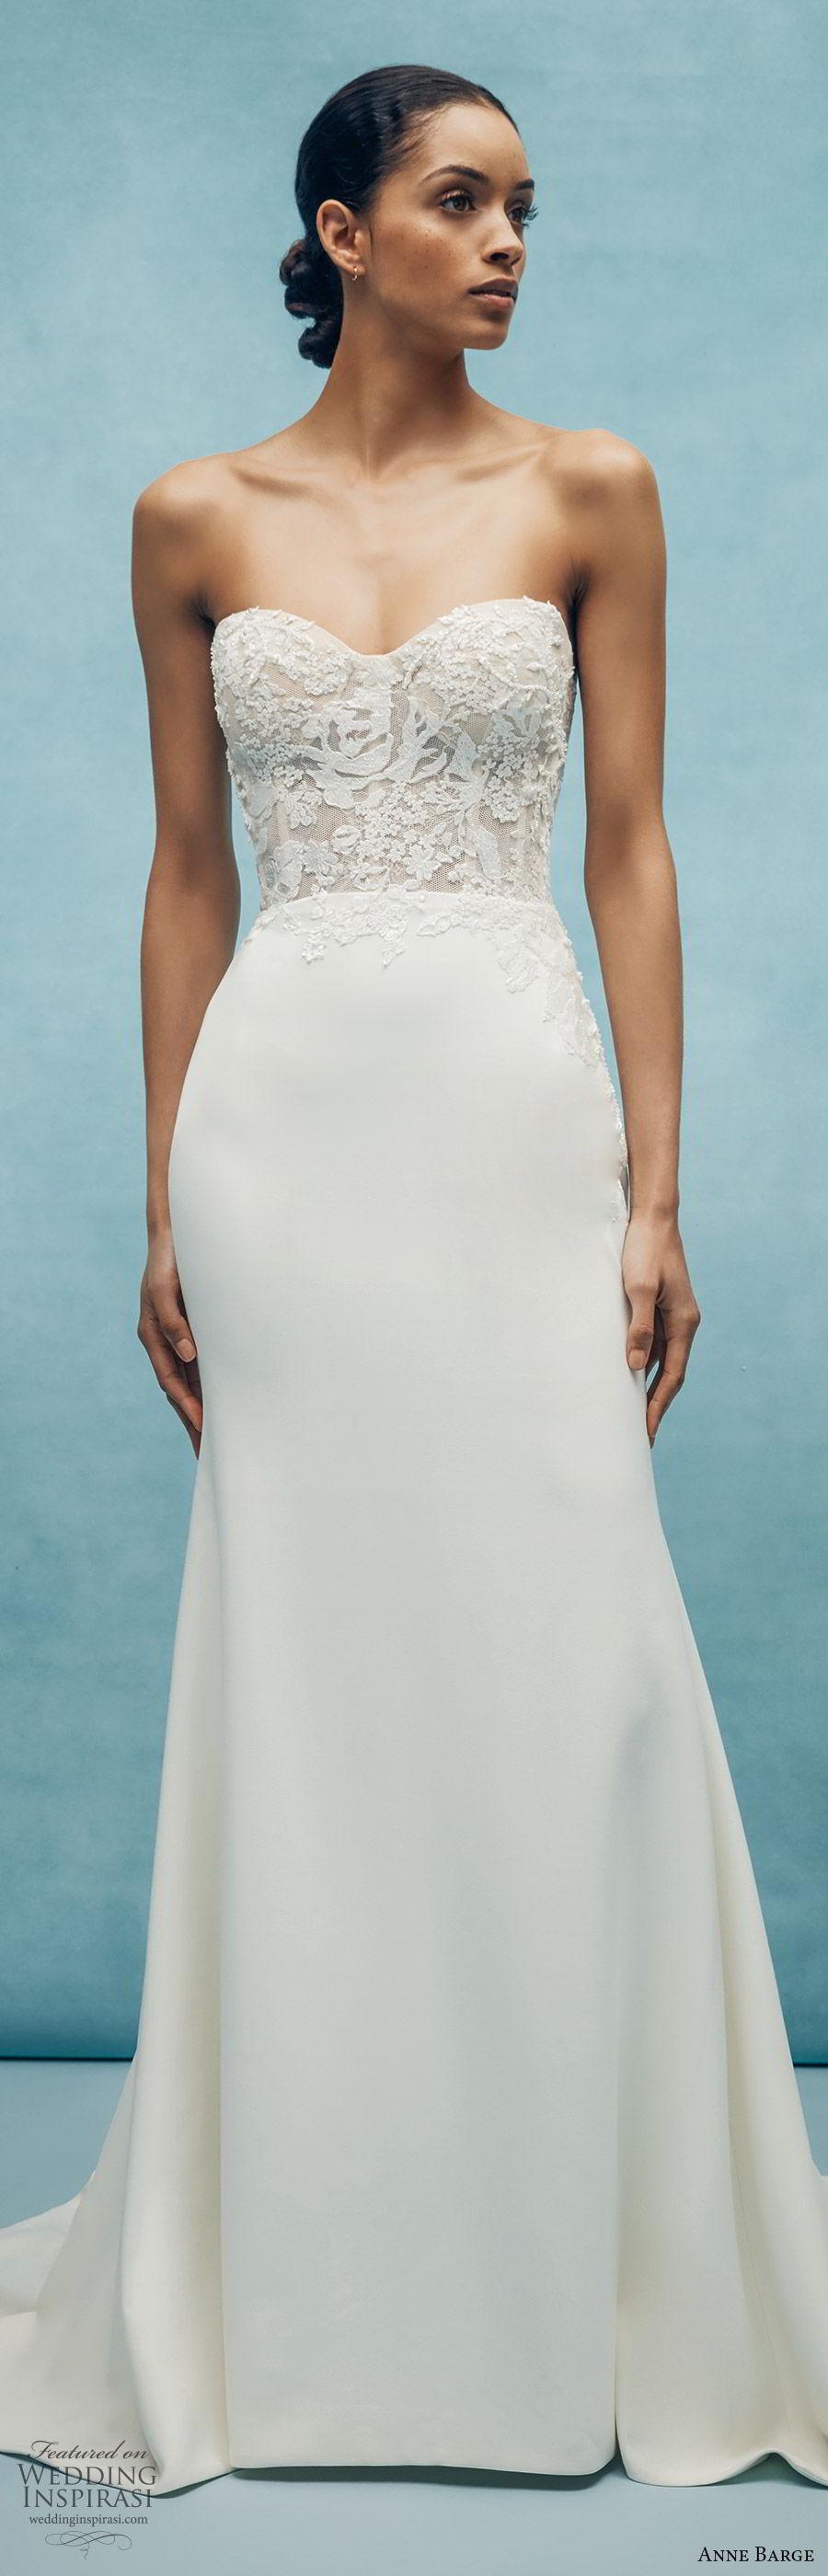 anne barge spring 2020 bridal strapless sweetheart lace bodice mermaid sheath wedding dress (1) romantic modern chapel train mv